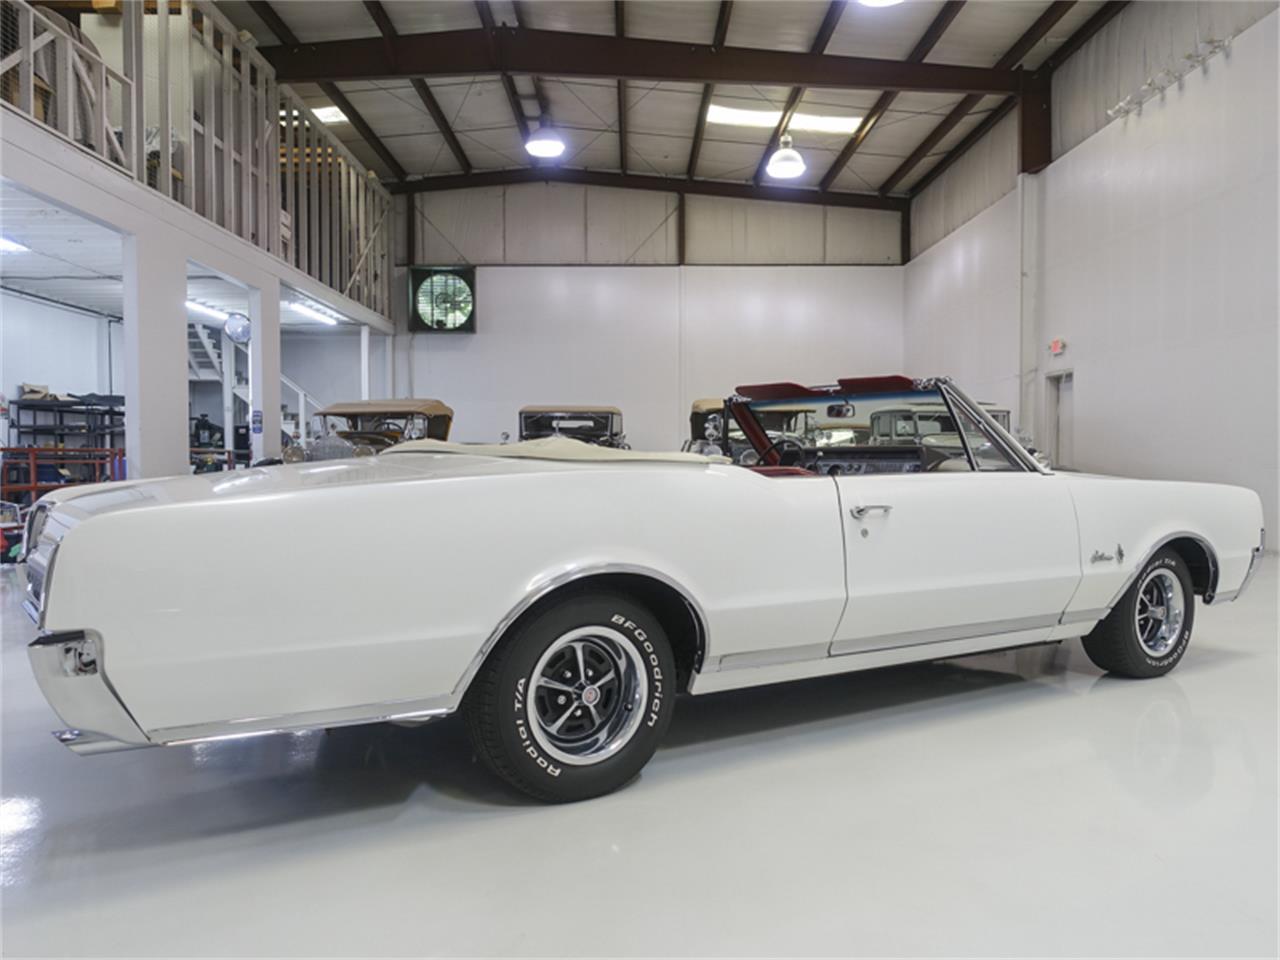 Large Picture of 1967 Cutlass Supreme - $29,900.00 Offered by Daniel Schmitt & Co. - QK0F